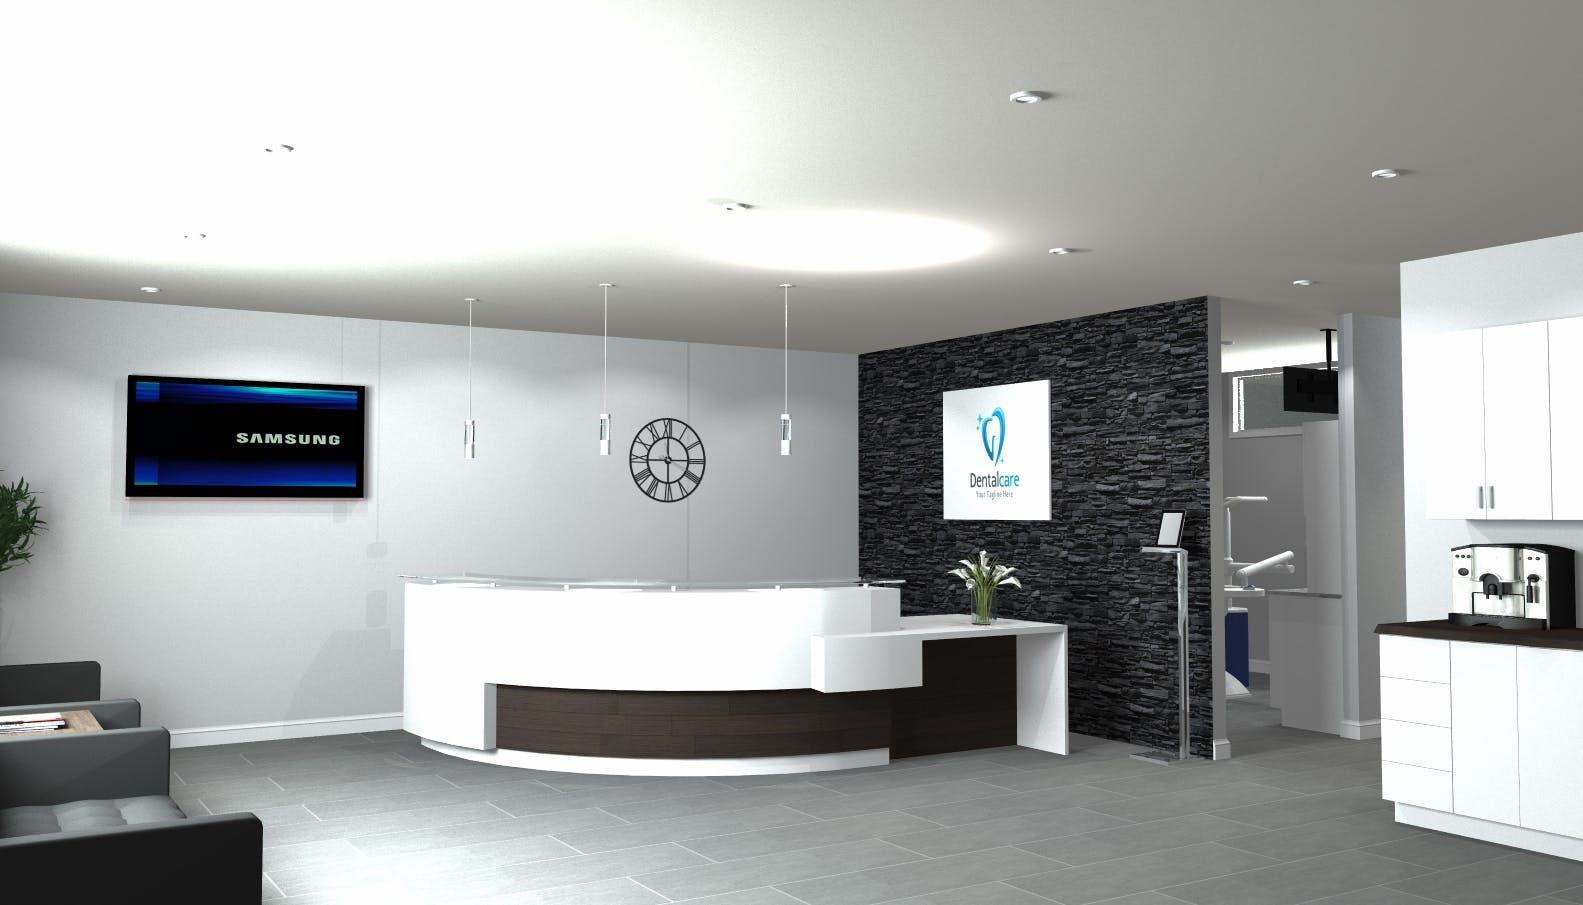 dental office design. 3D Rendering And Virtual Reality Dental Office Design G